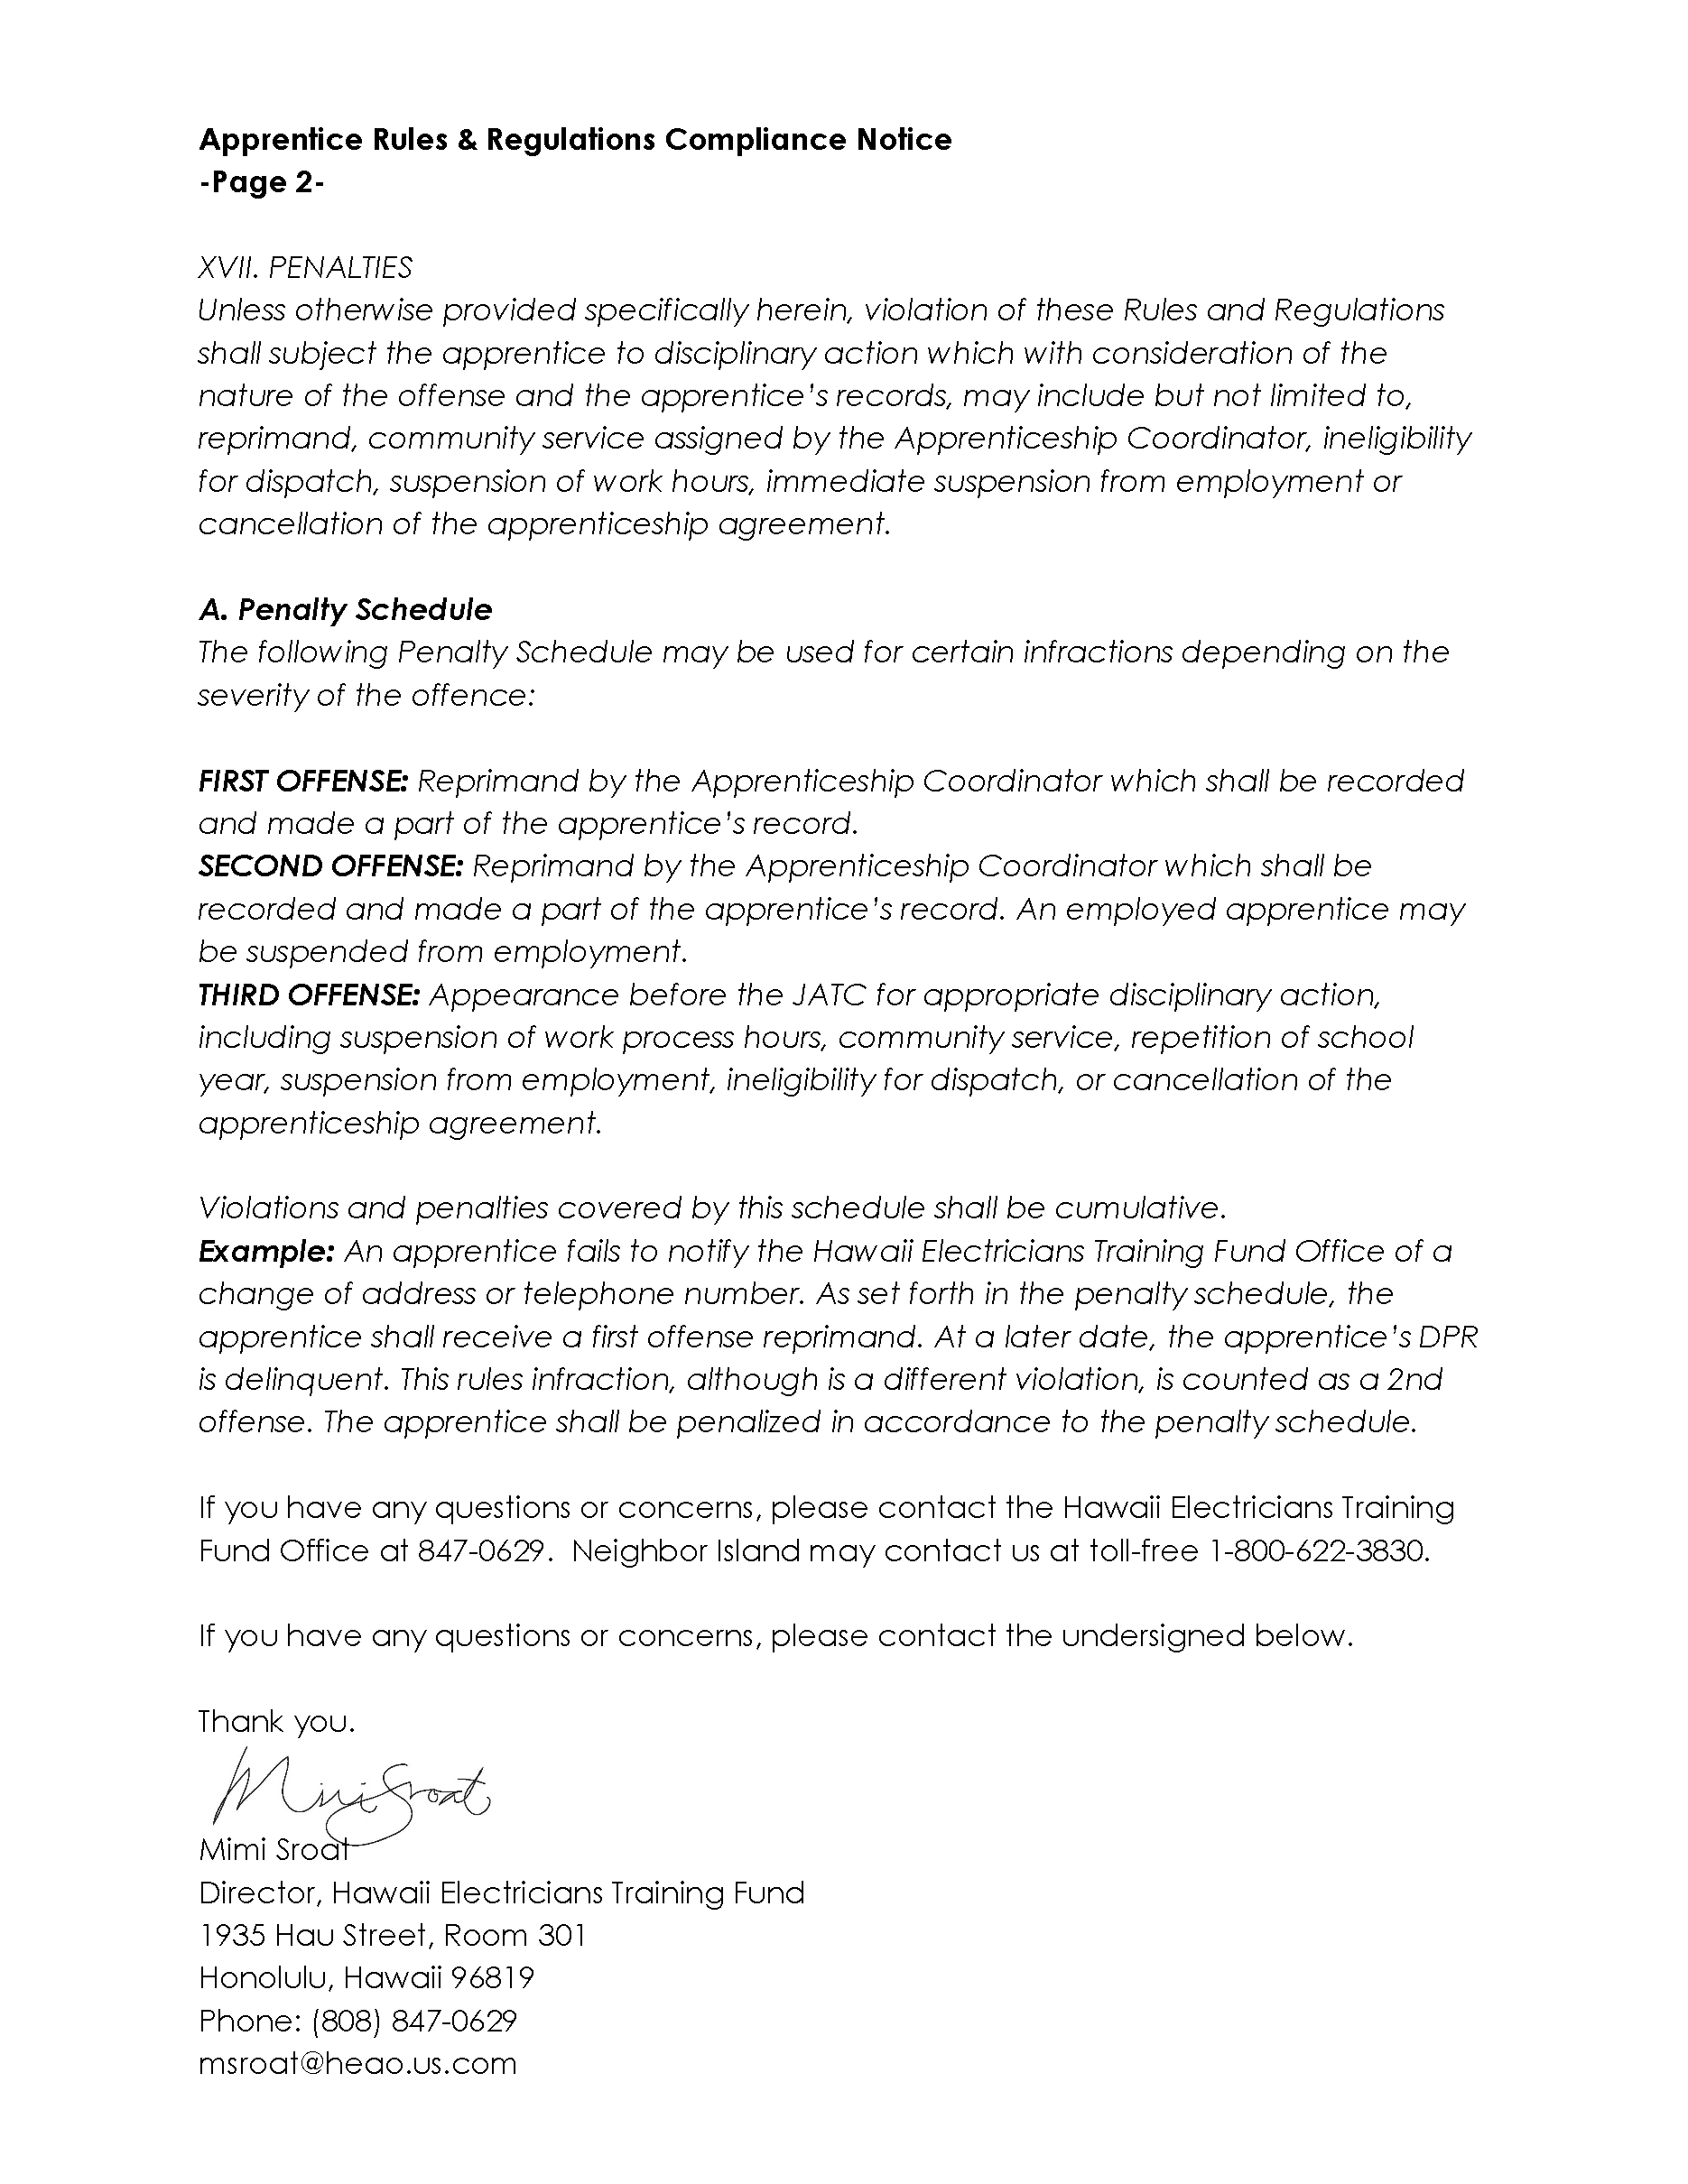 APPRENTICE RR COMPLIANCE (REV 02-06-19)_Page_2.png